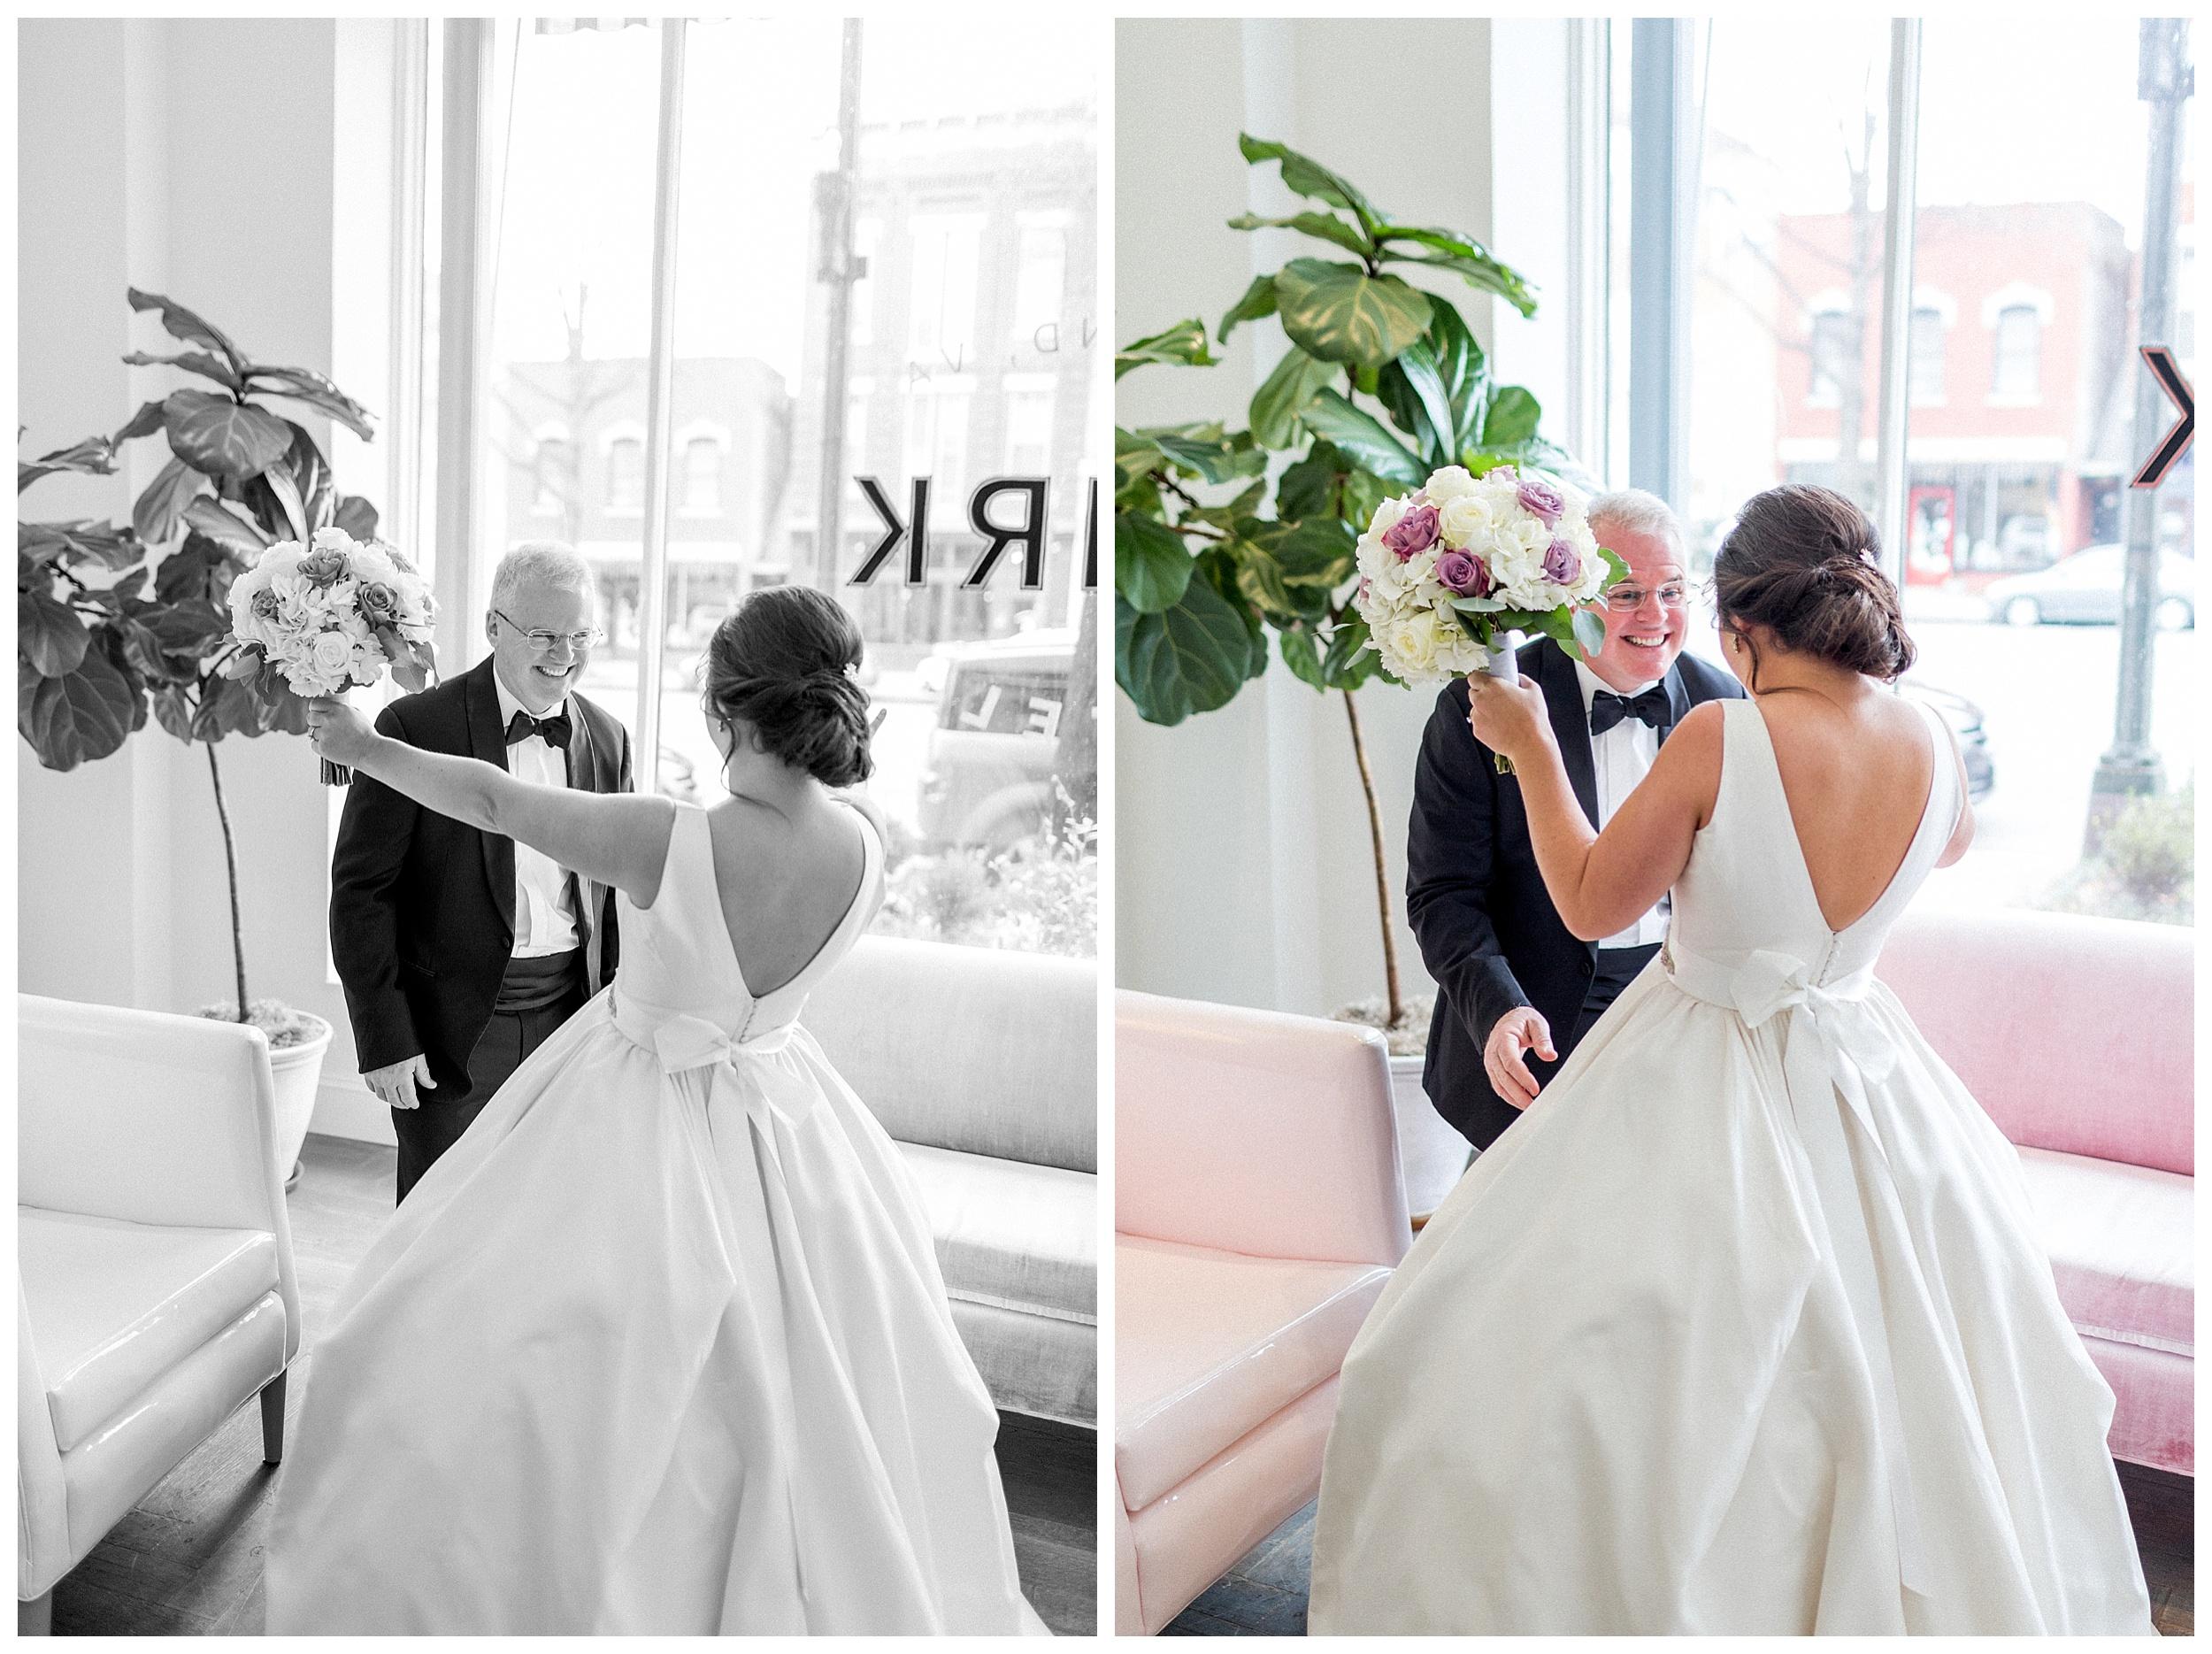 Country Club of Virginia Wedding | Richmond Wedding Photographer_0070.jpg